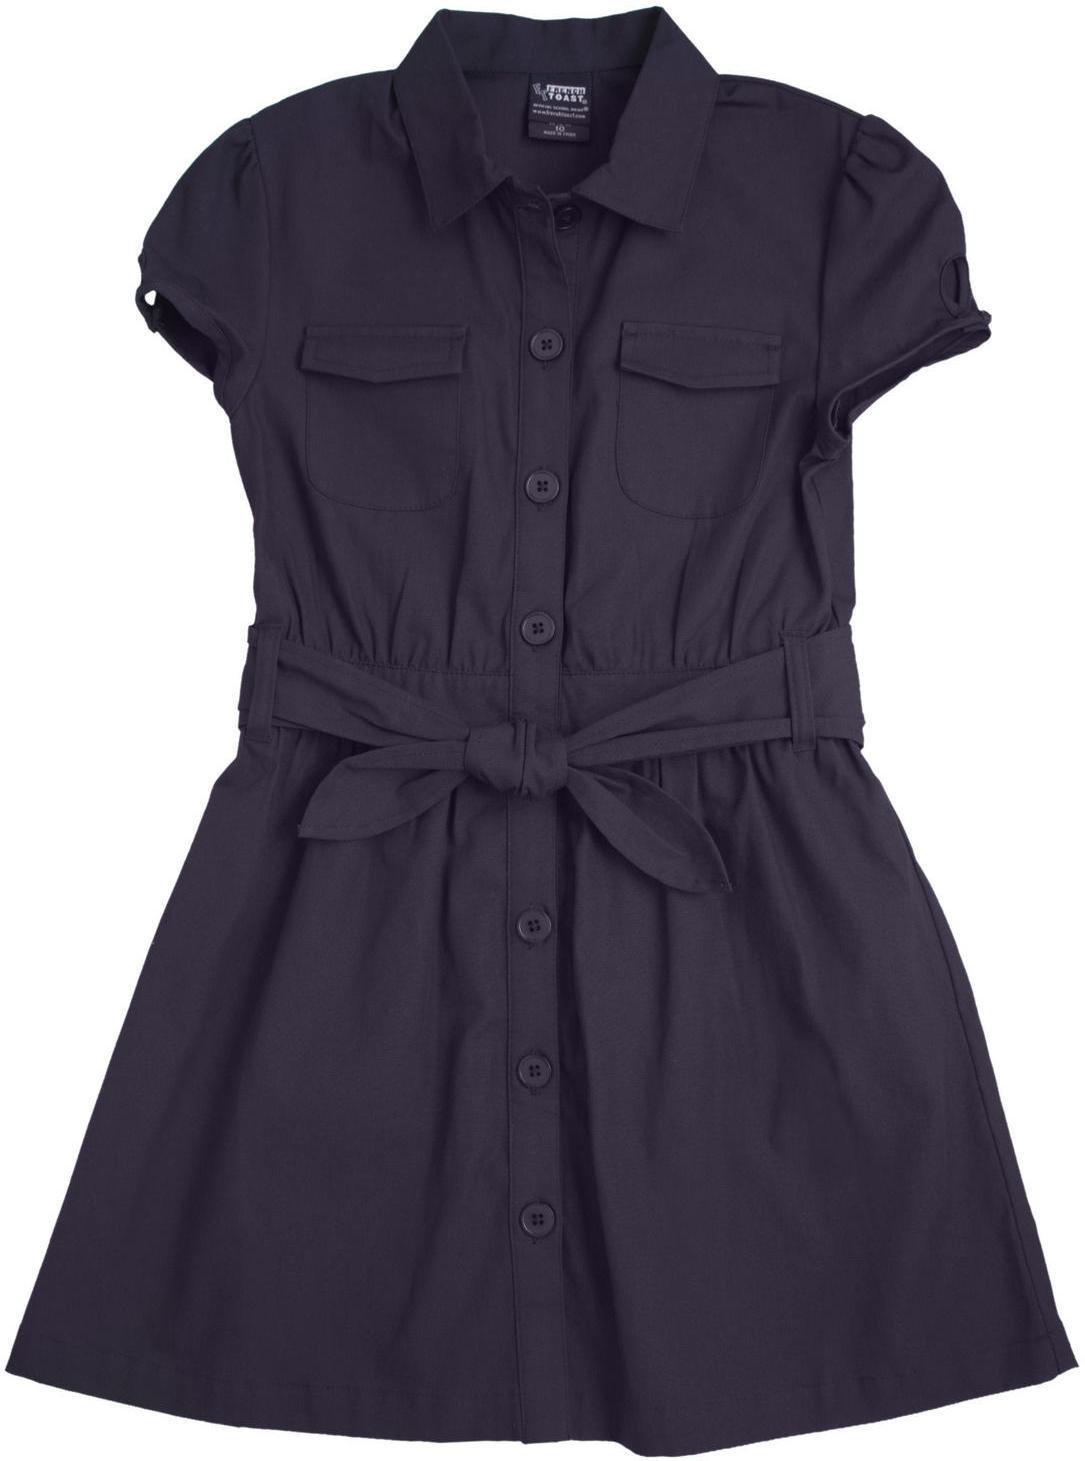 French Toast School Uniform Girls Canvas Safari Shirt-Dress, Navy, 4T